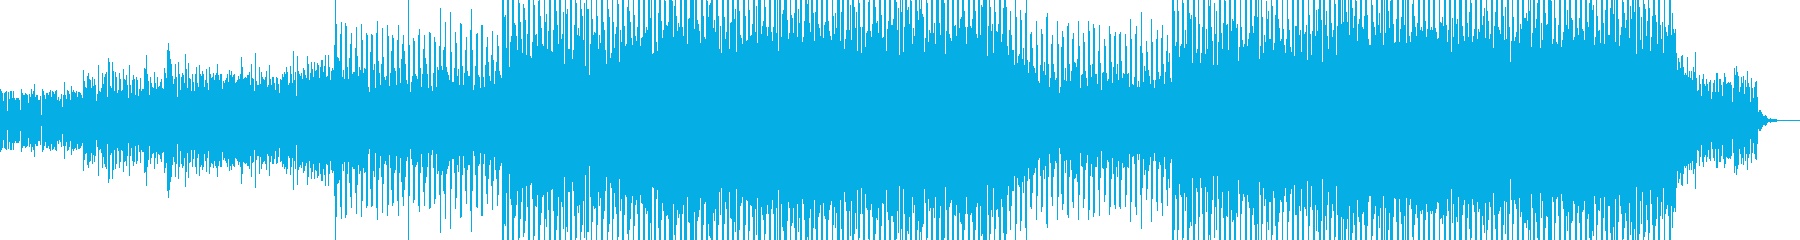 EDMポップで明るいクラブ系-19の再生済みの波形